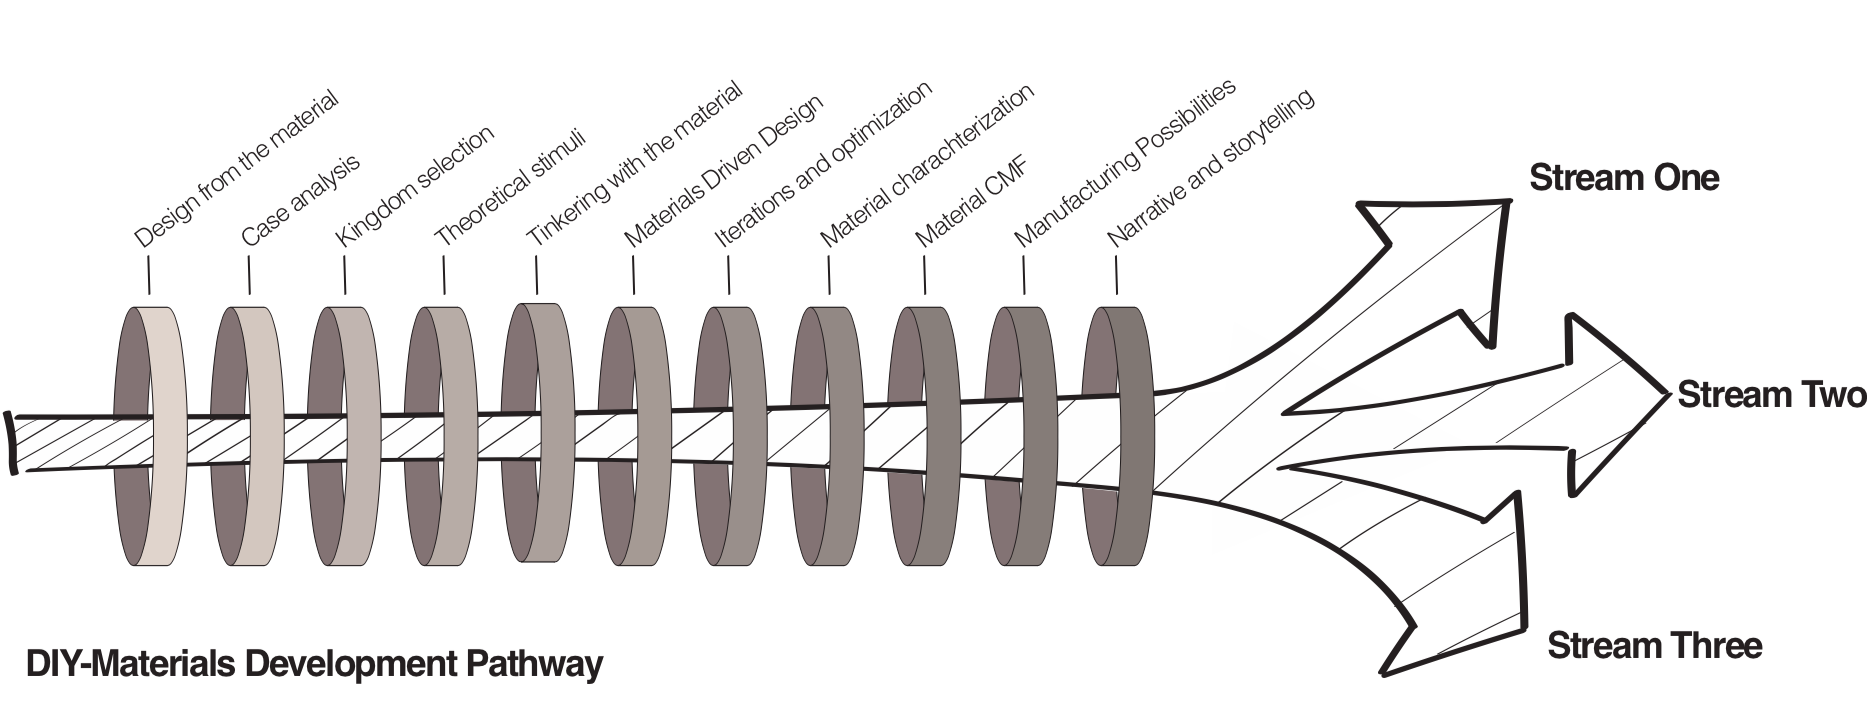 The DIY-Materials Roadmap schema.